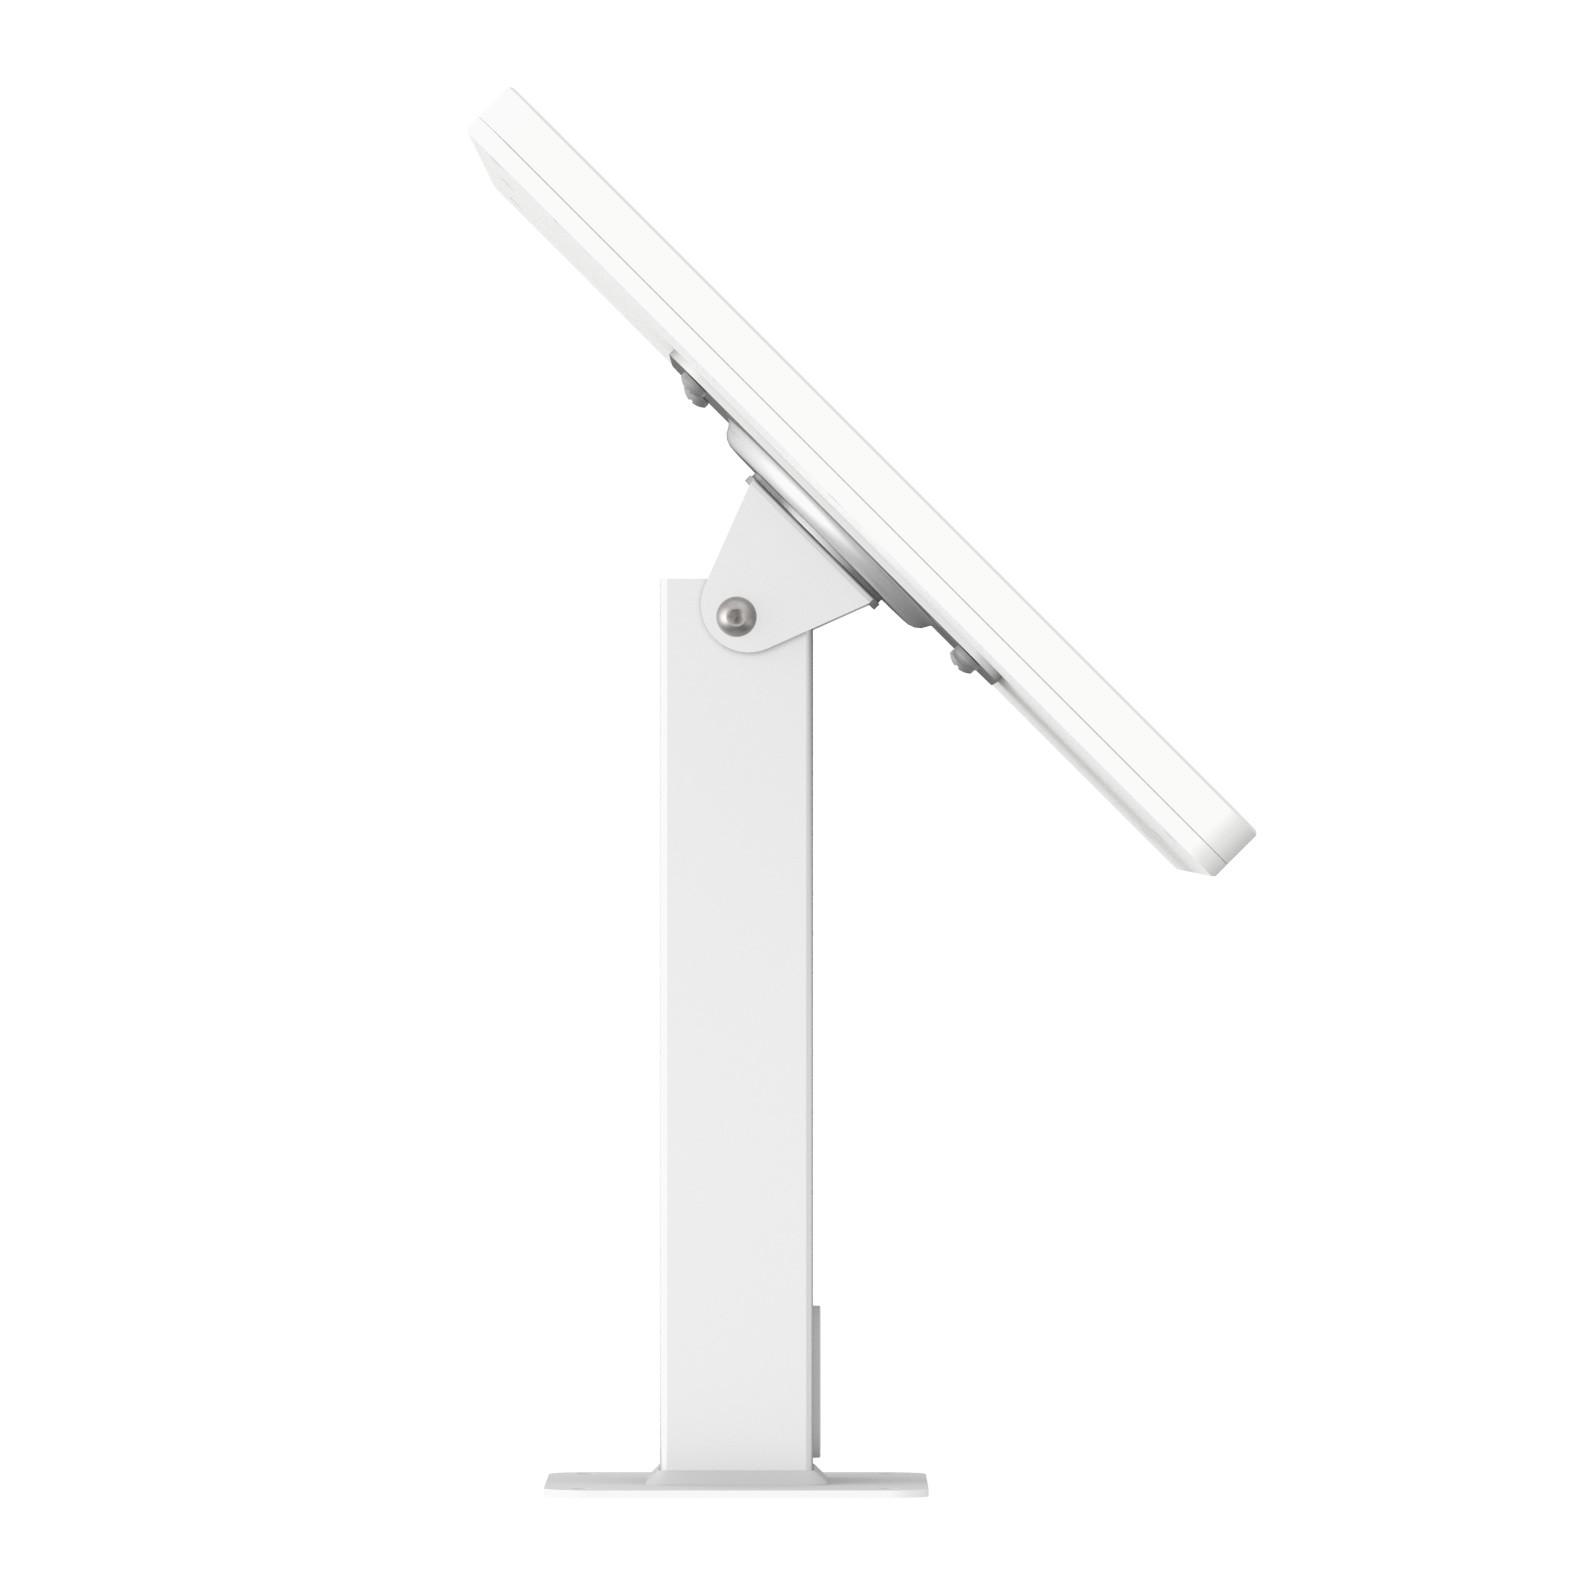 12 9-inch iPad Pro 3rd Gen White Enclosure w  360 Rotate & Tilt Surface  Mount